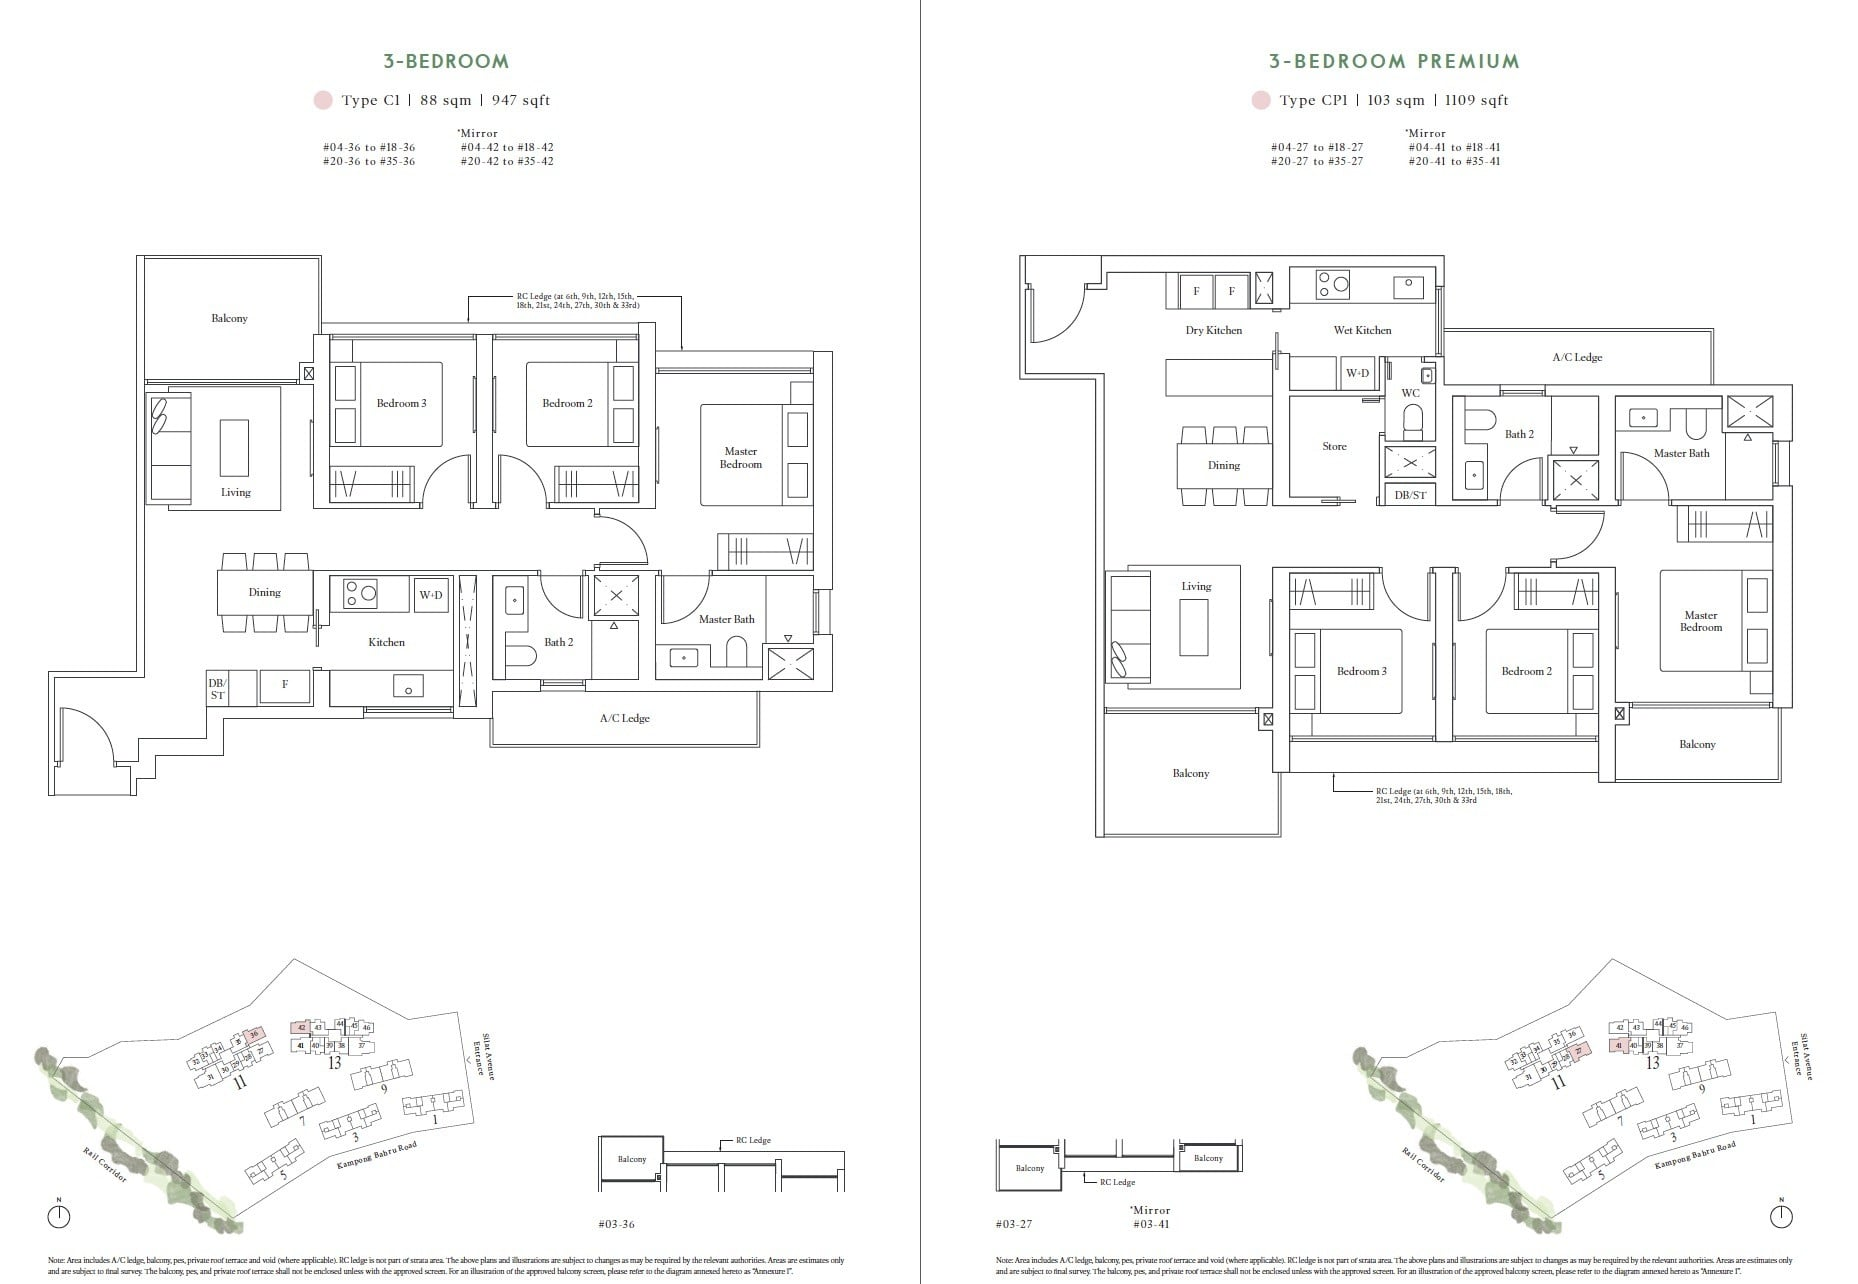 Avenue-South-Residences-FloorPlan 3BR